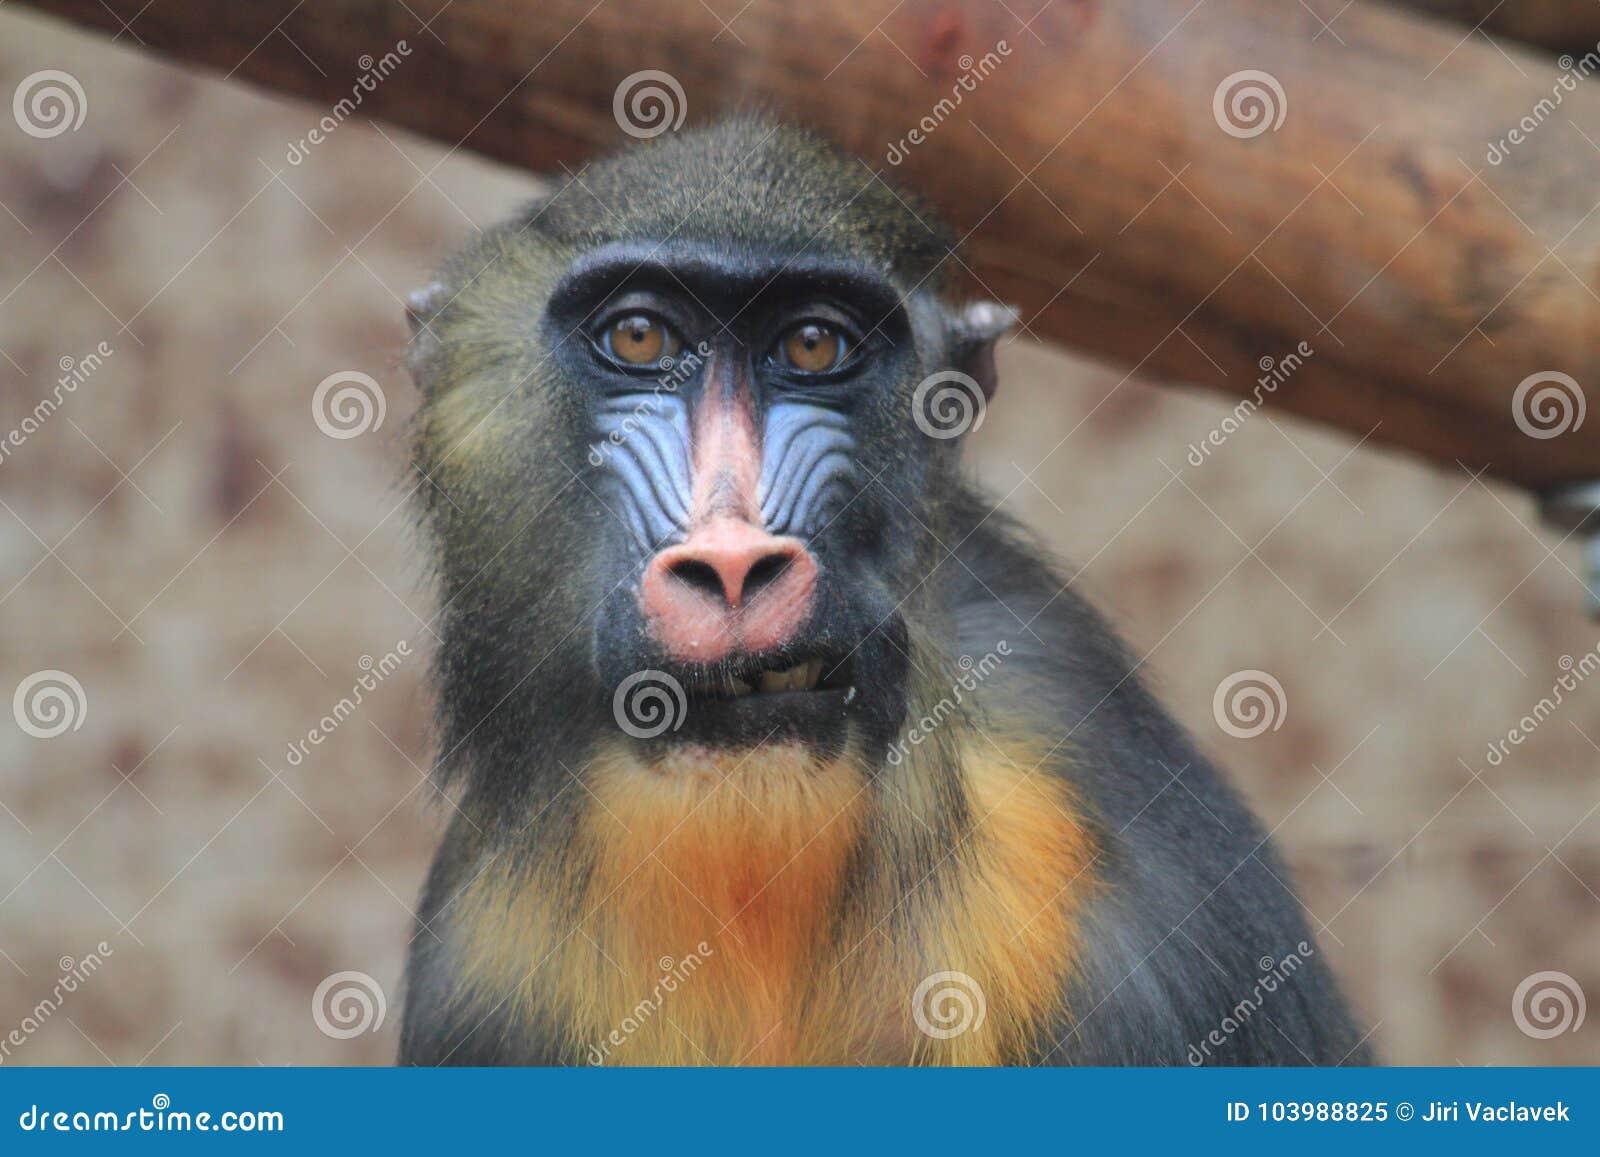 baboon monkey head